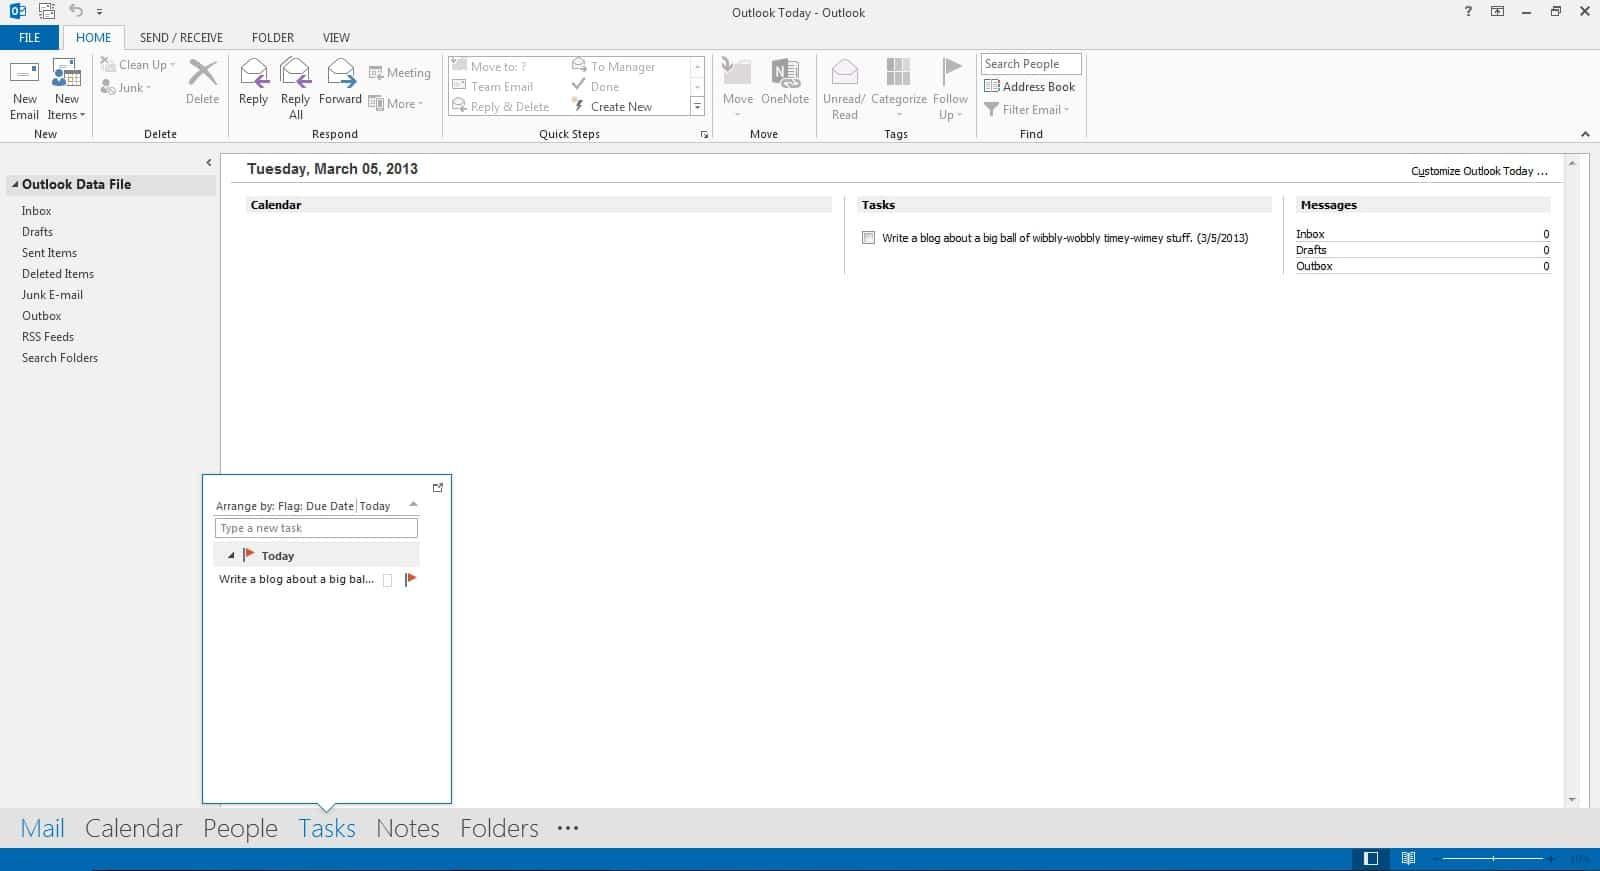 Outlook 2013 Navigation Bar